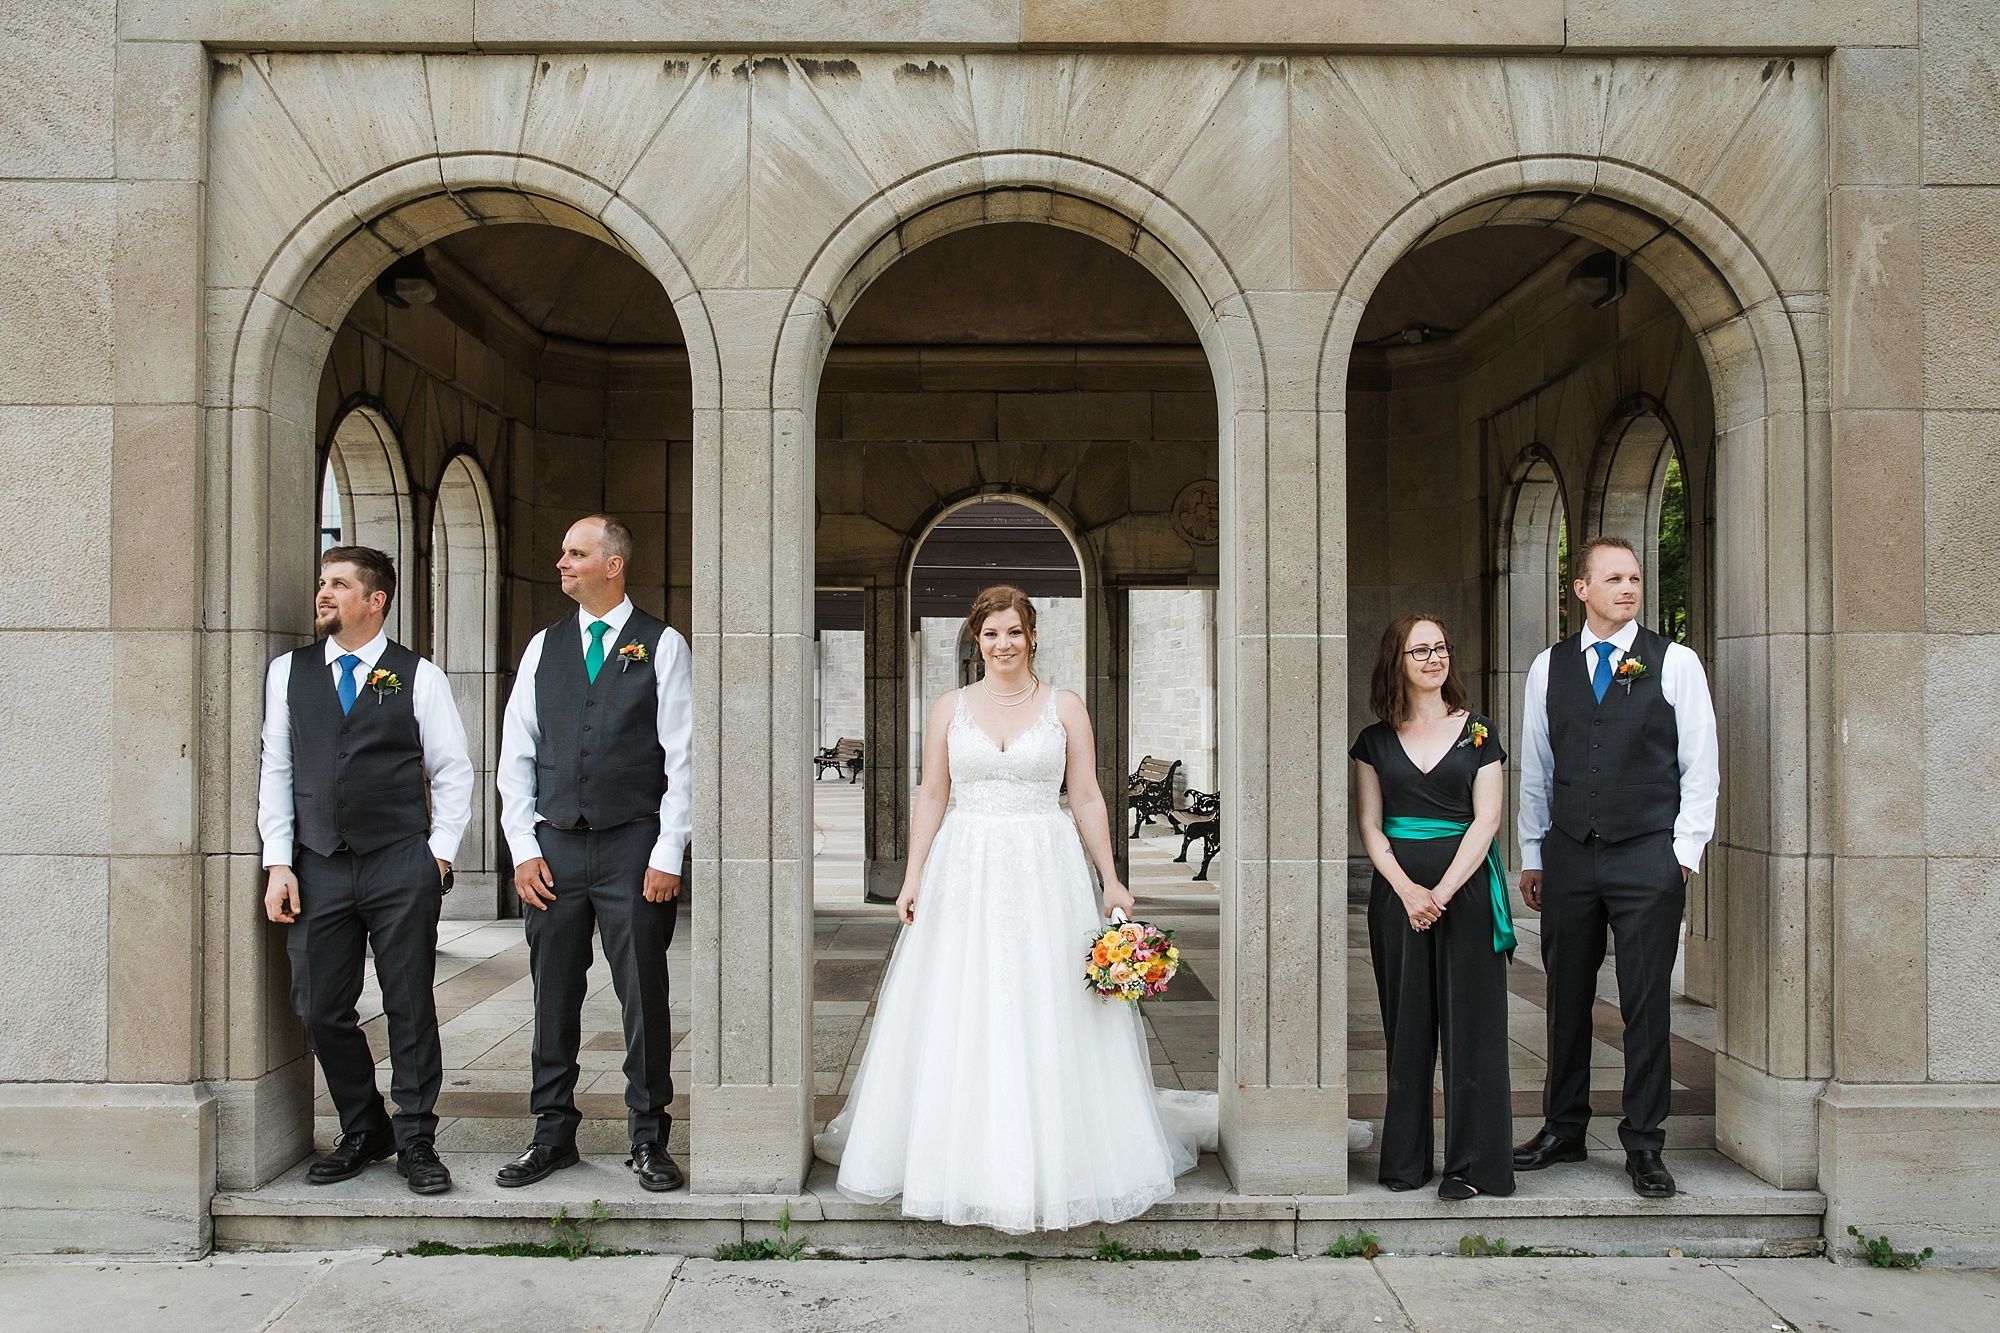 niagarafalls-weddingphotography_0043.jpg